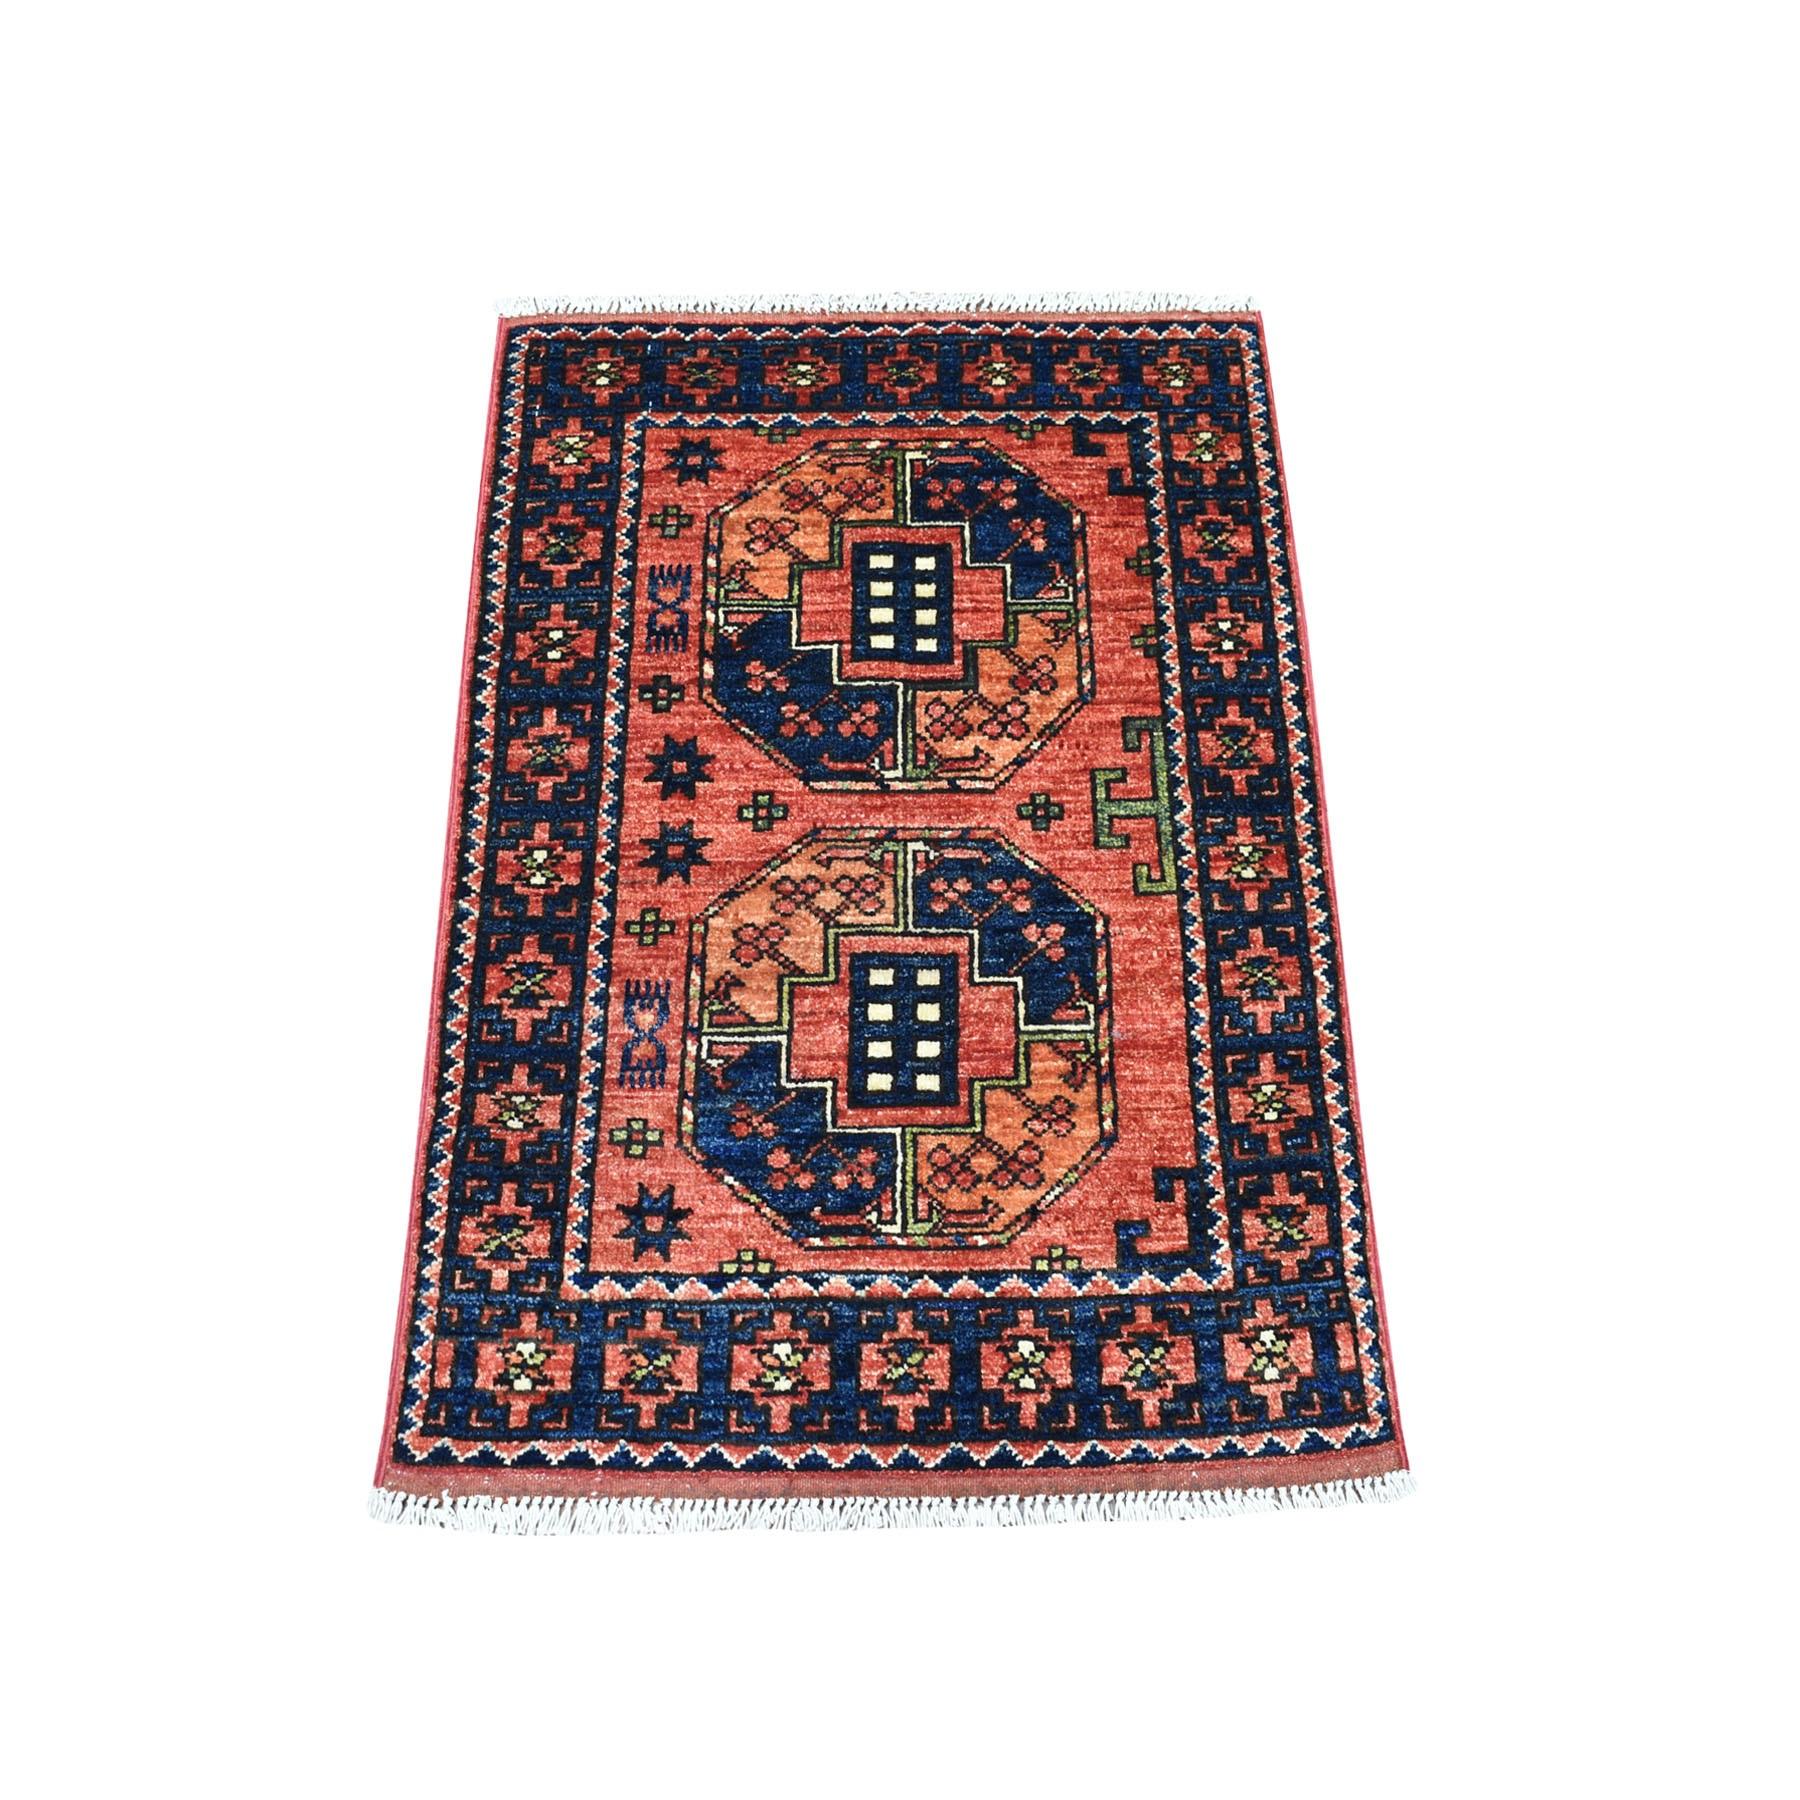 "2'1""X3' Red Elephant Feet Design Afghan Ersari Pure Wool Hand Knotted Oriental Rug moaecba7"